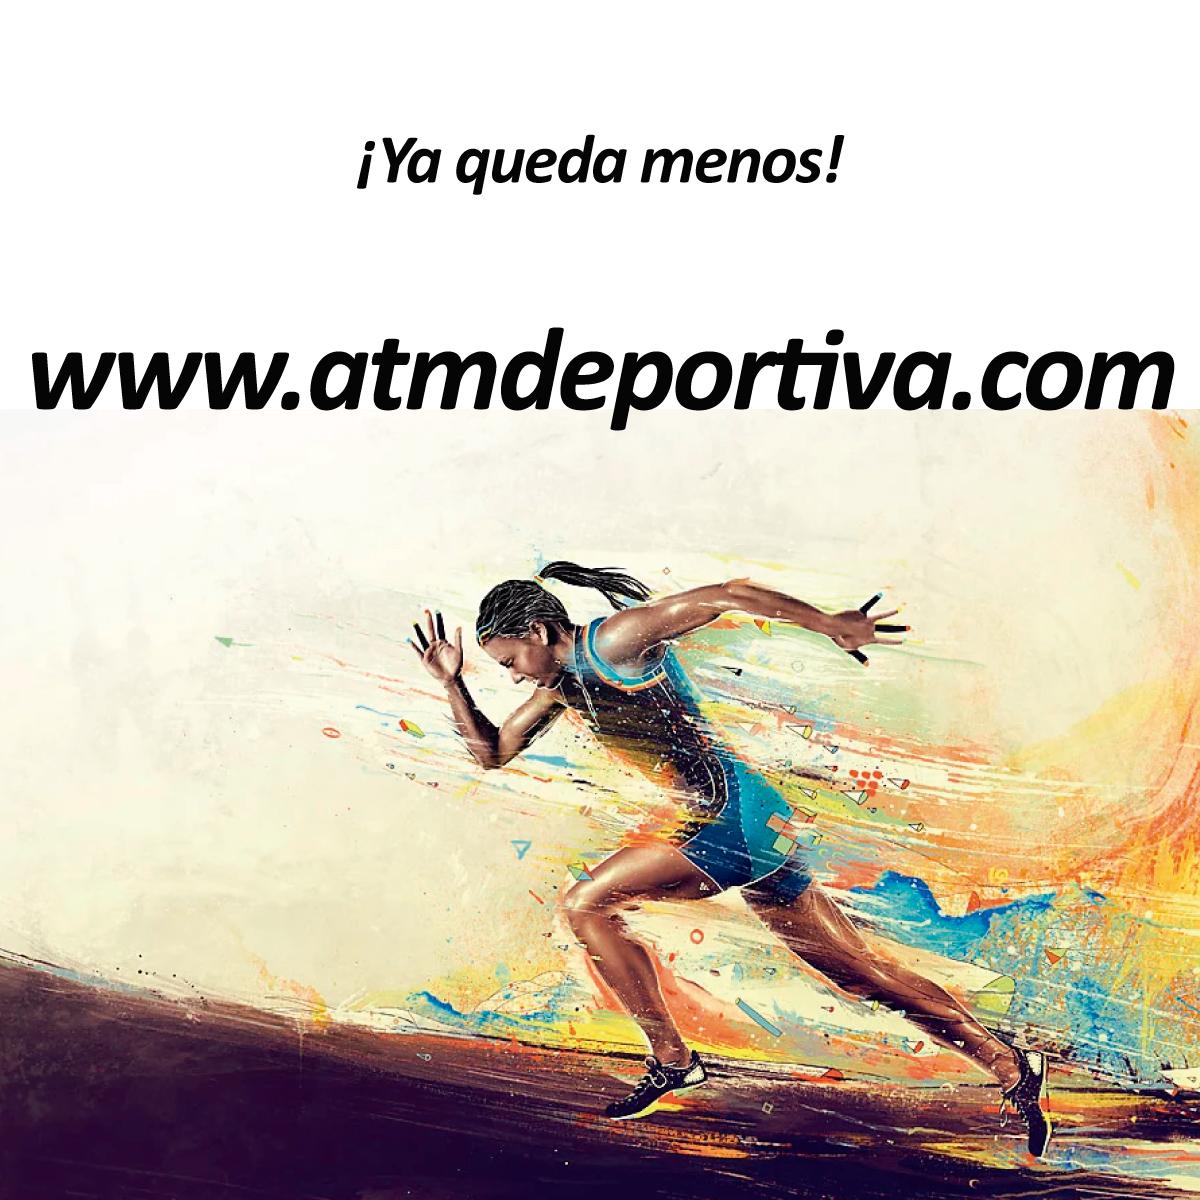 Proximamente... Atmdeportiva #deporte #sports #deportiva #atmpadel #atmdeportiva #atmrunning #tiendaonline #fitness #motivacion #trainning #spain  #follow #like4like #like  #oferta #tenis #fronton #raquetas #smile #chollos #calidadprecio #zapatillas #raquetas #palas #motivation https://t.co/AxvUUexE5z